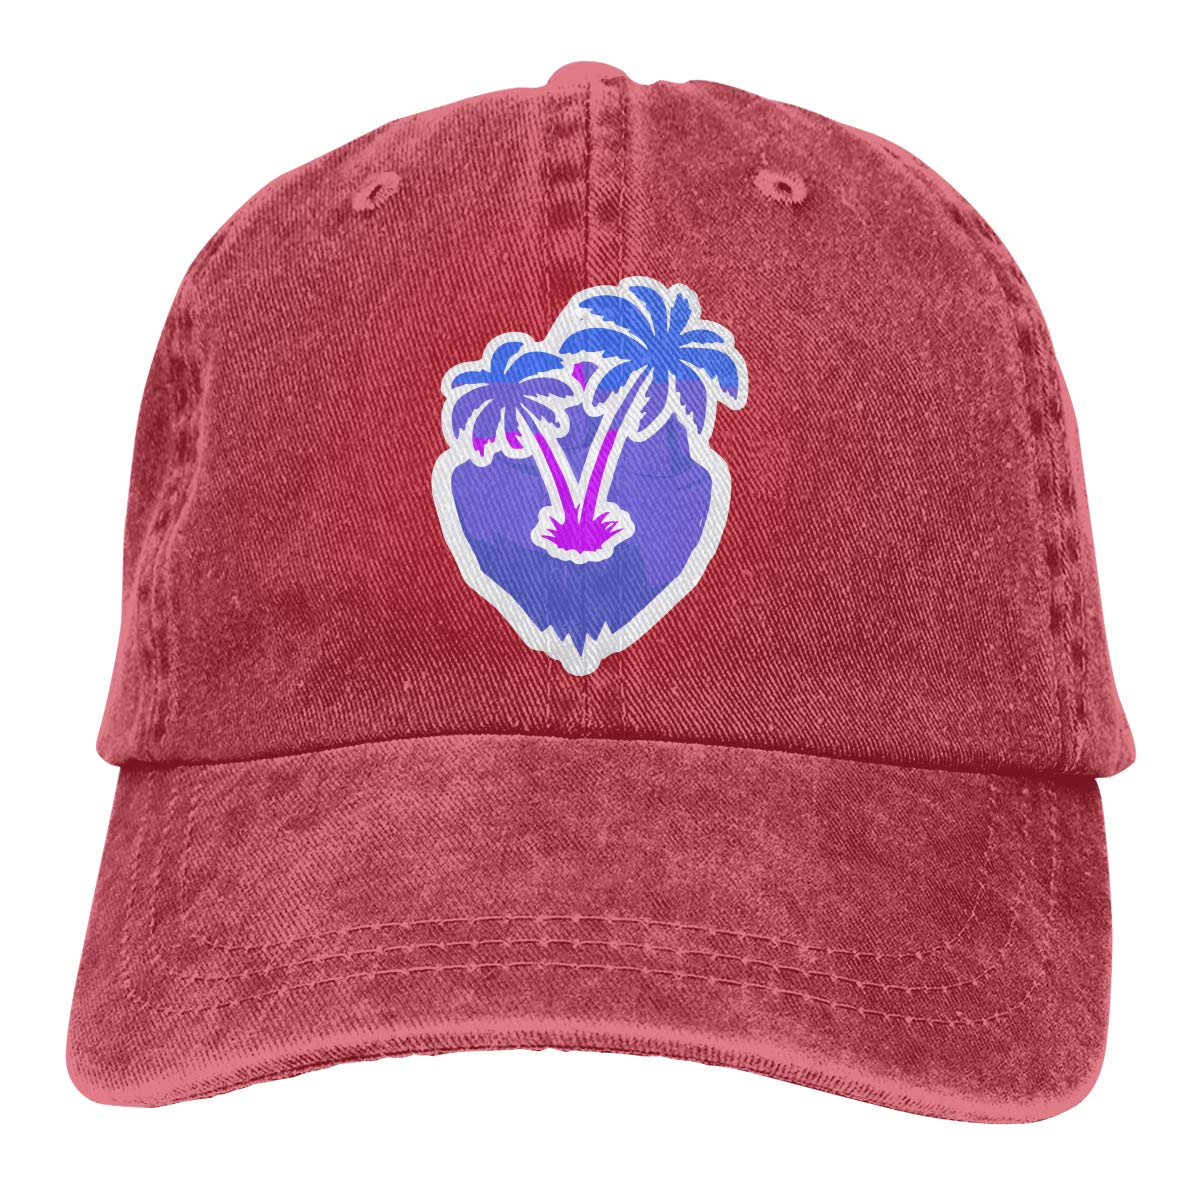 Blue-Violet Island Unisex Custom Cowboy Outdoor Sports Hat Adjustable Baseball Cap